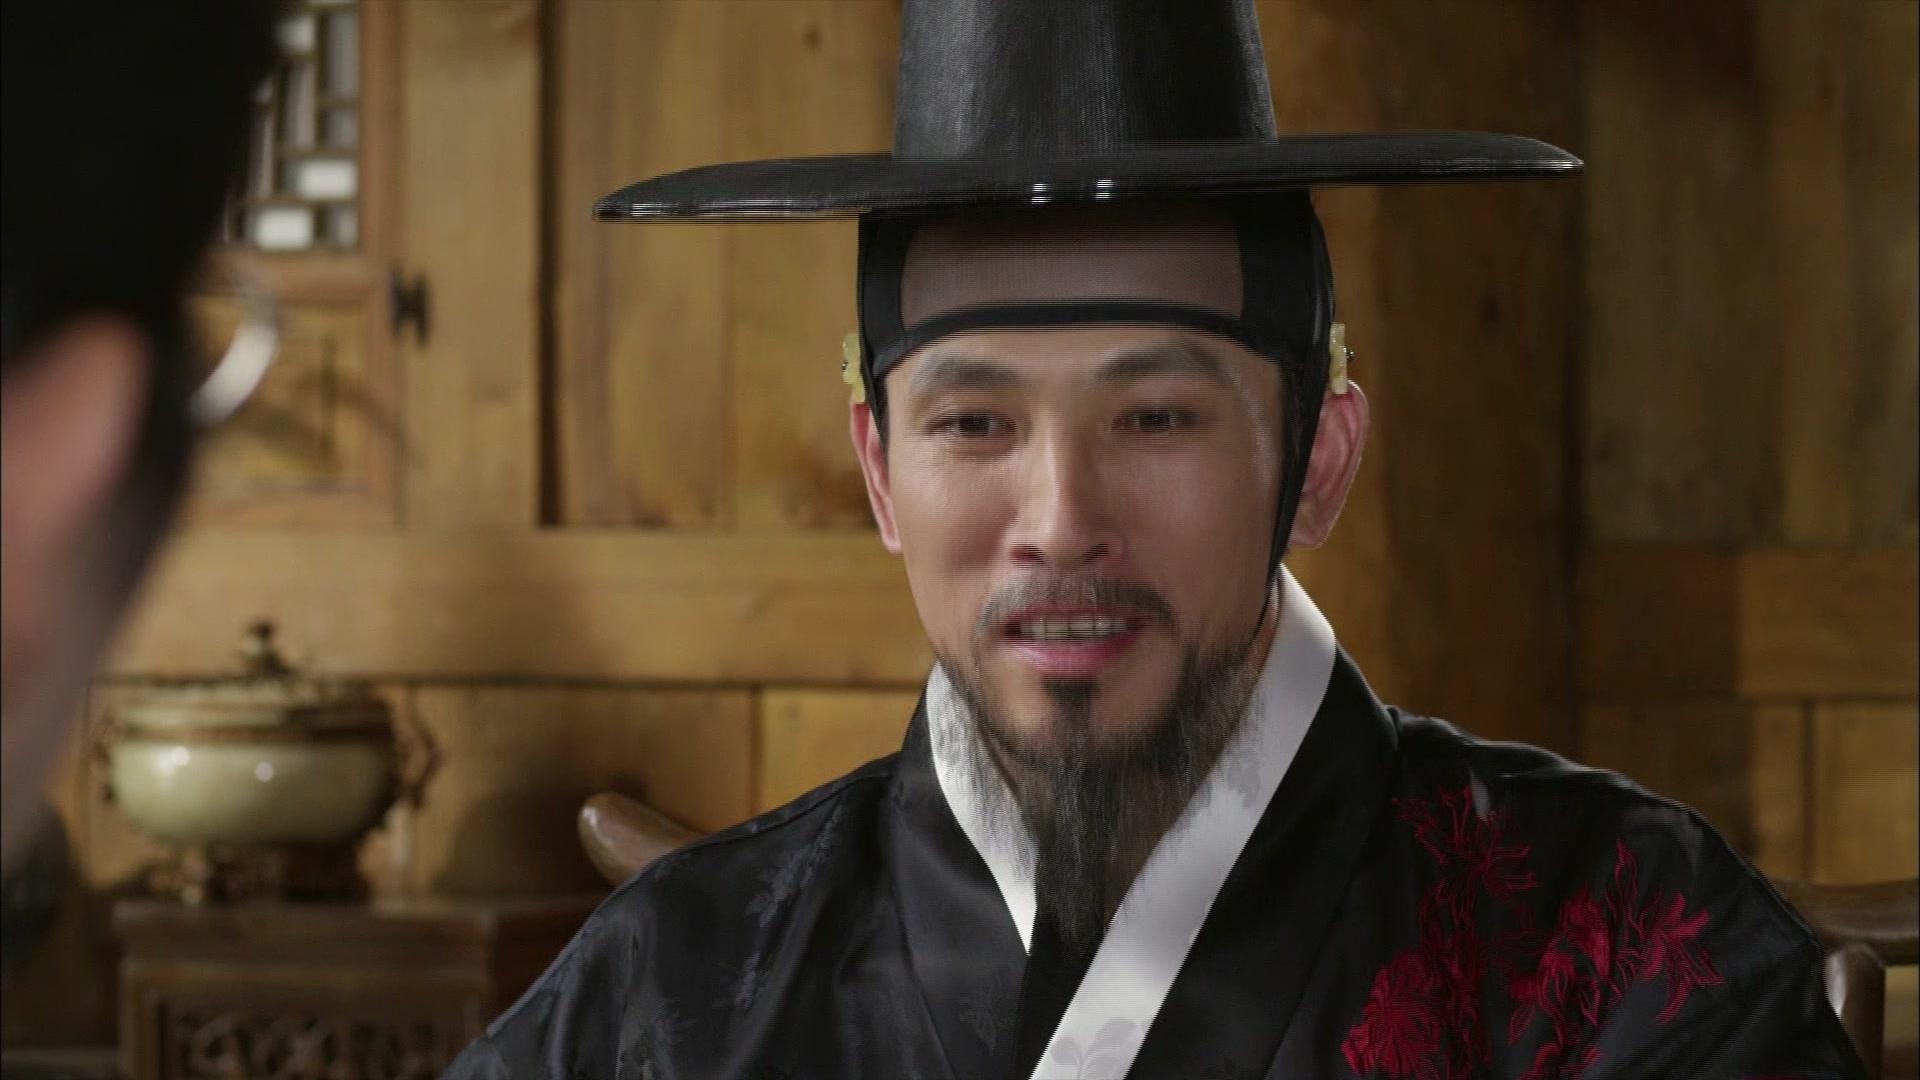 Gunman in Joseon Episode 5